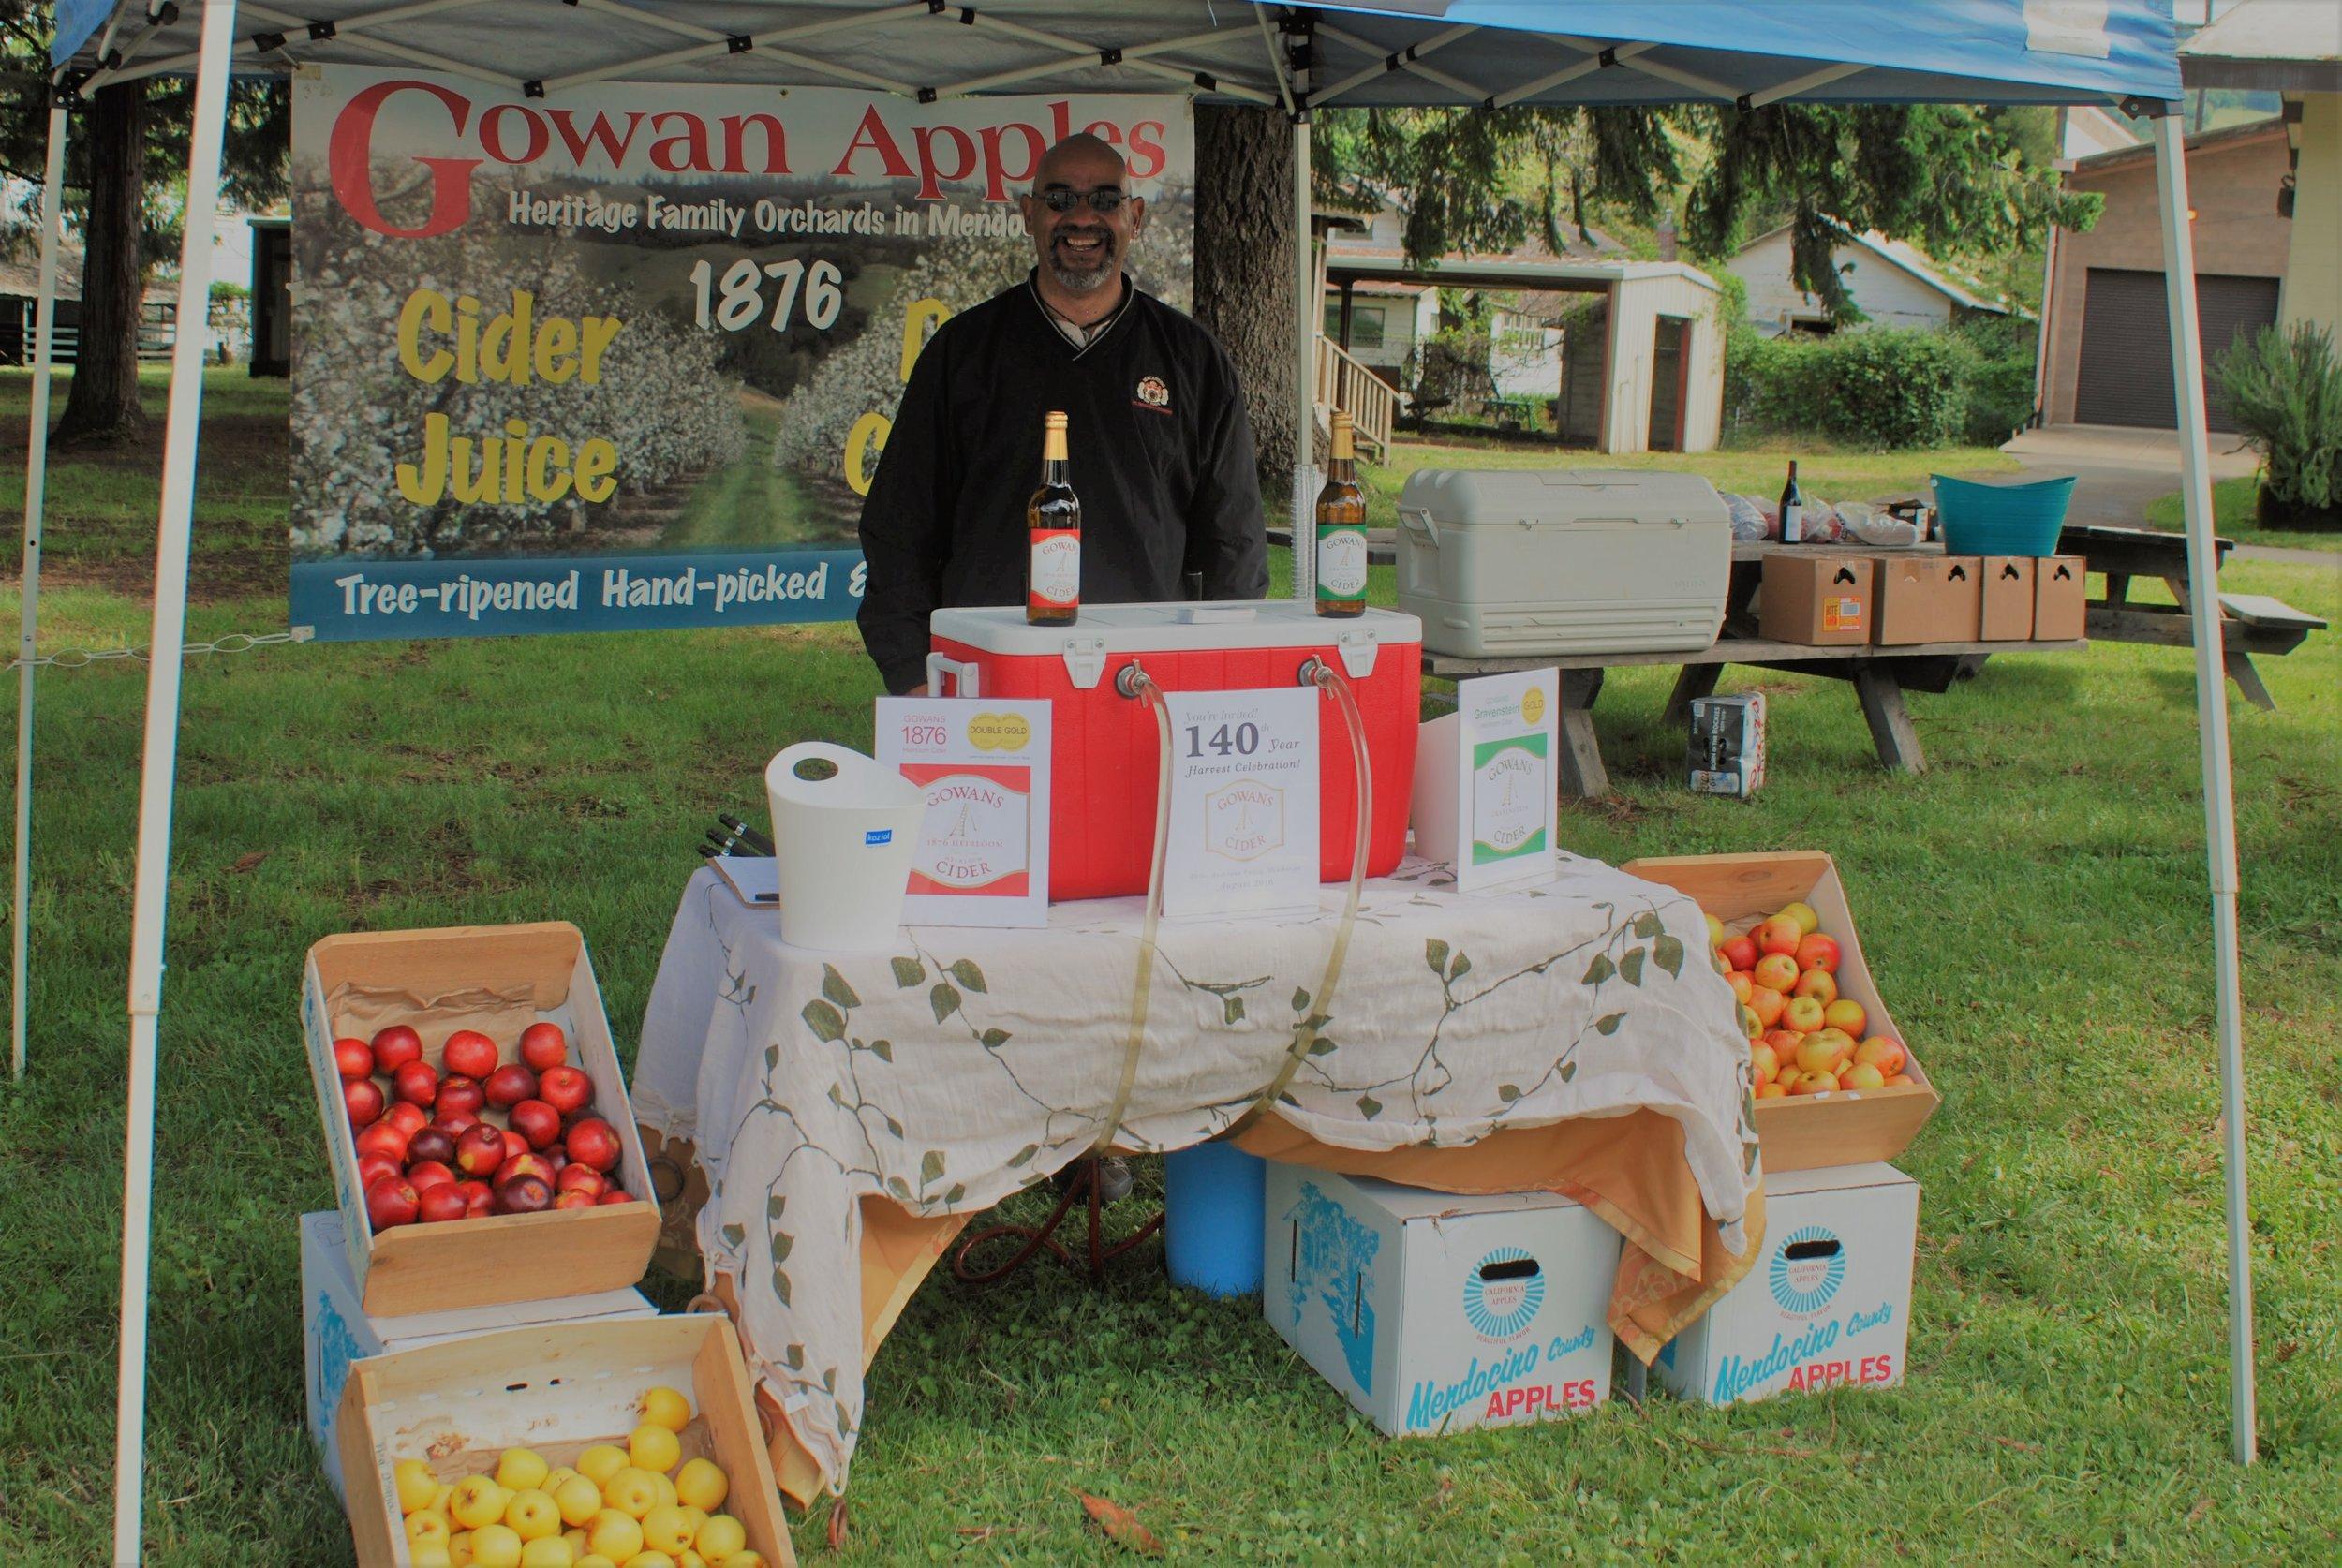 Gowan Apples-Cider